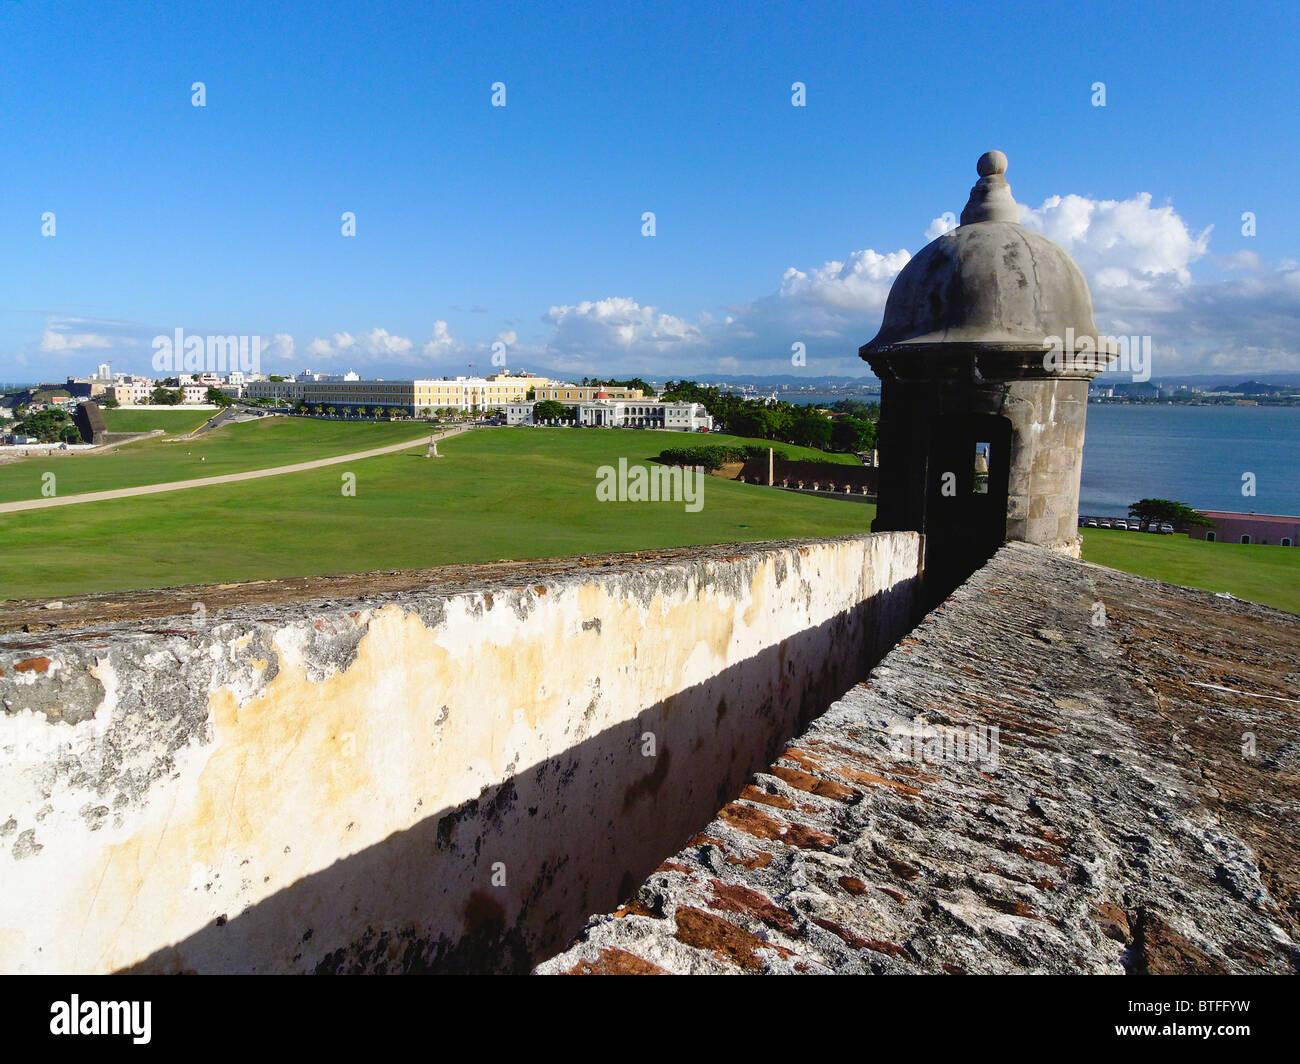 Old San Juan View from El Morro Fort, Puerto Rico - Stock Image